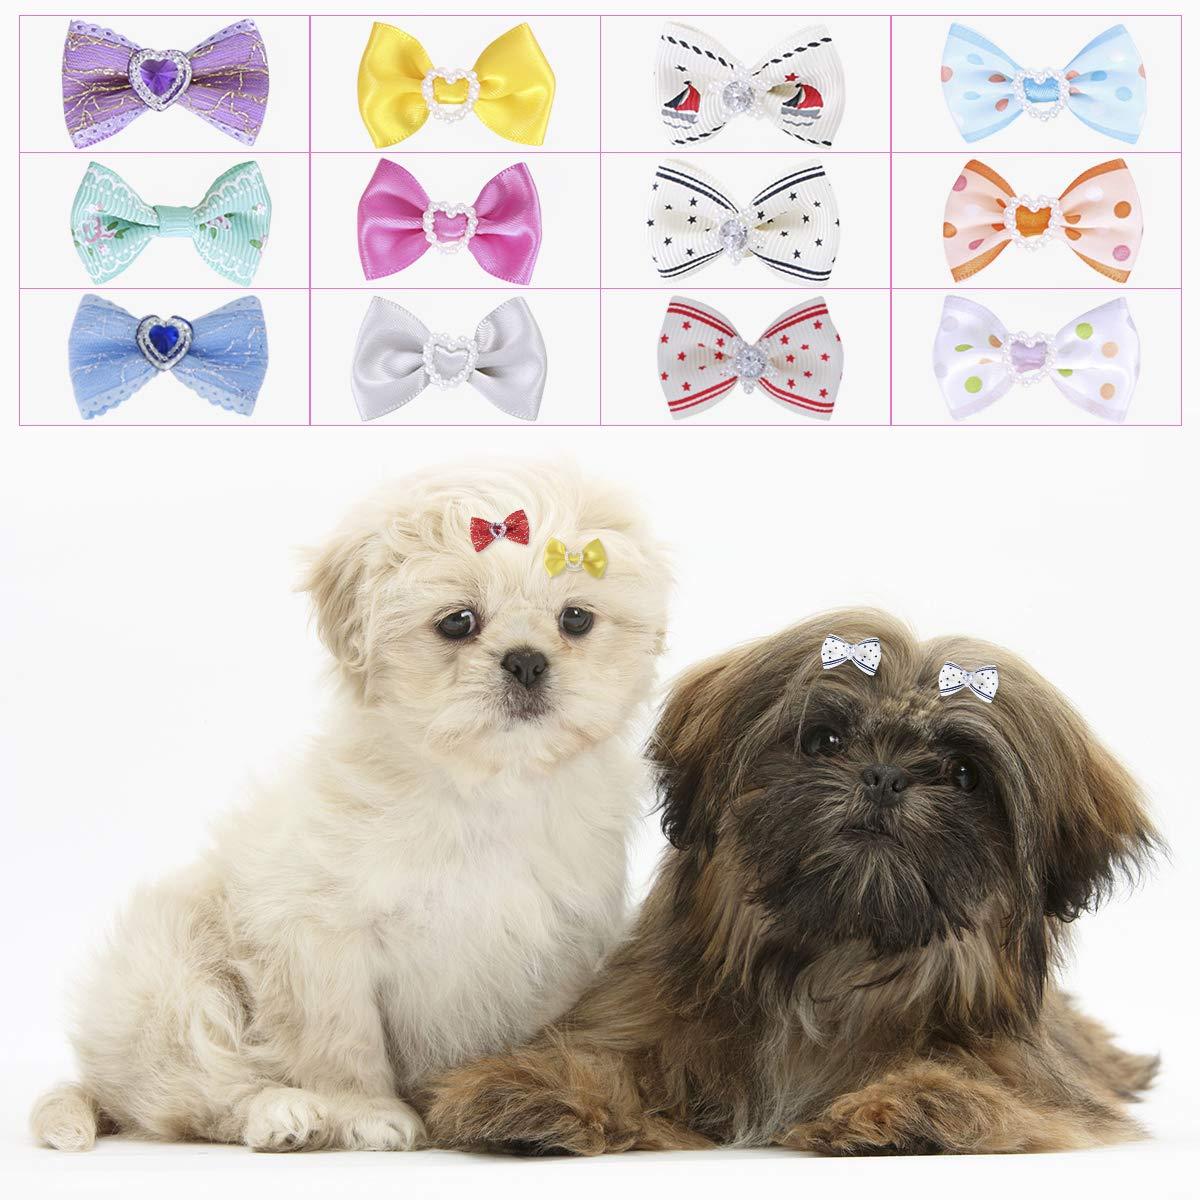 POPETPOP UEETEK 60PCS Multicolor Rubber Bands Elastic Hair Bands Bowknot Headwear Headdress for Pets Cat Dog